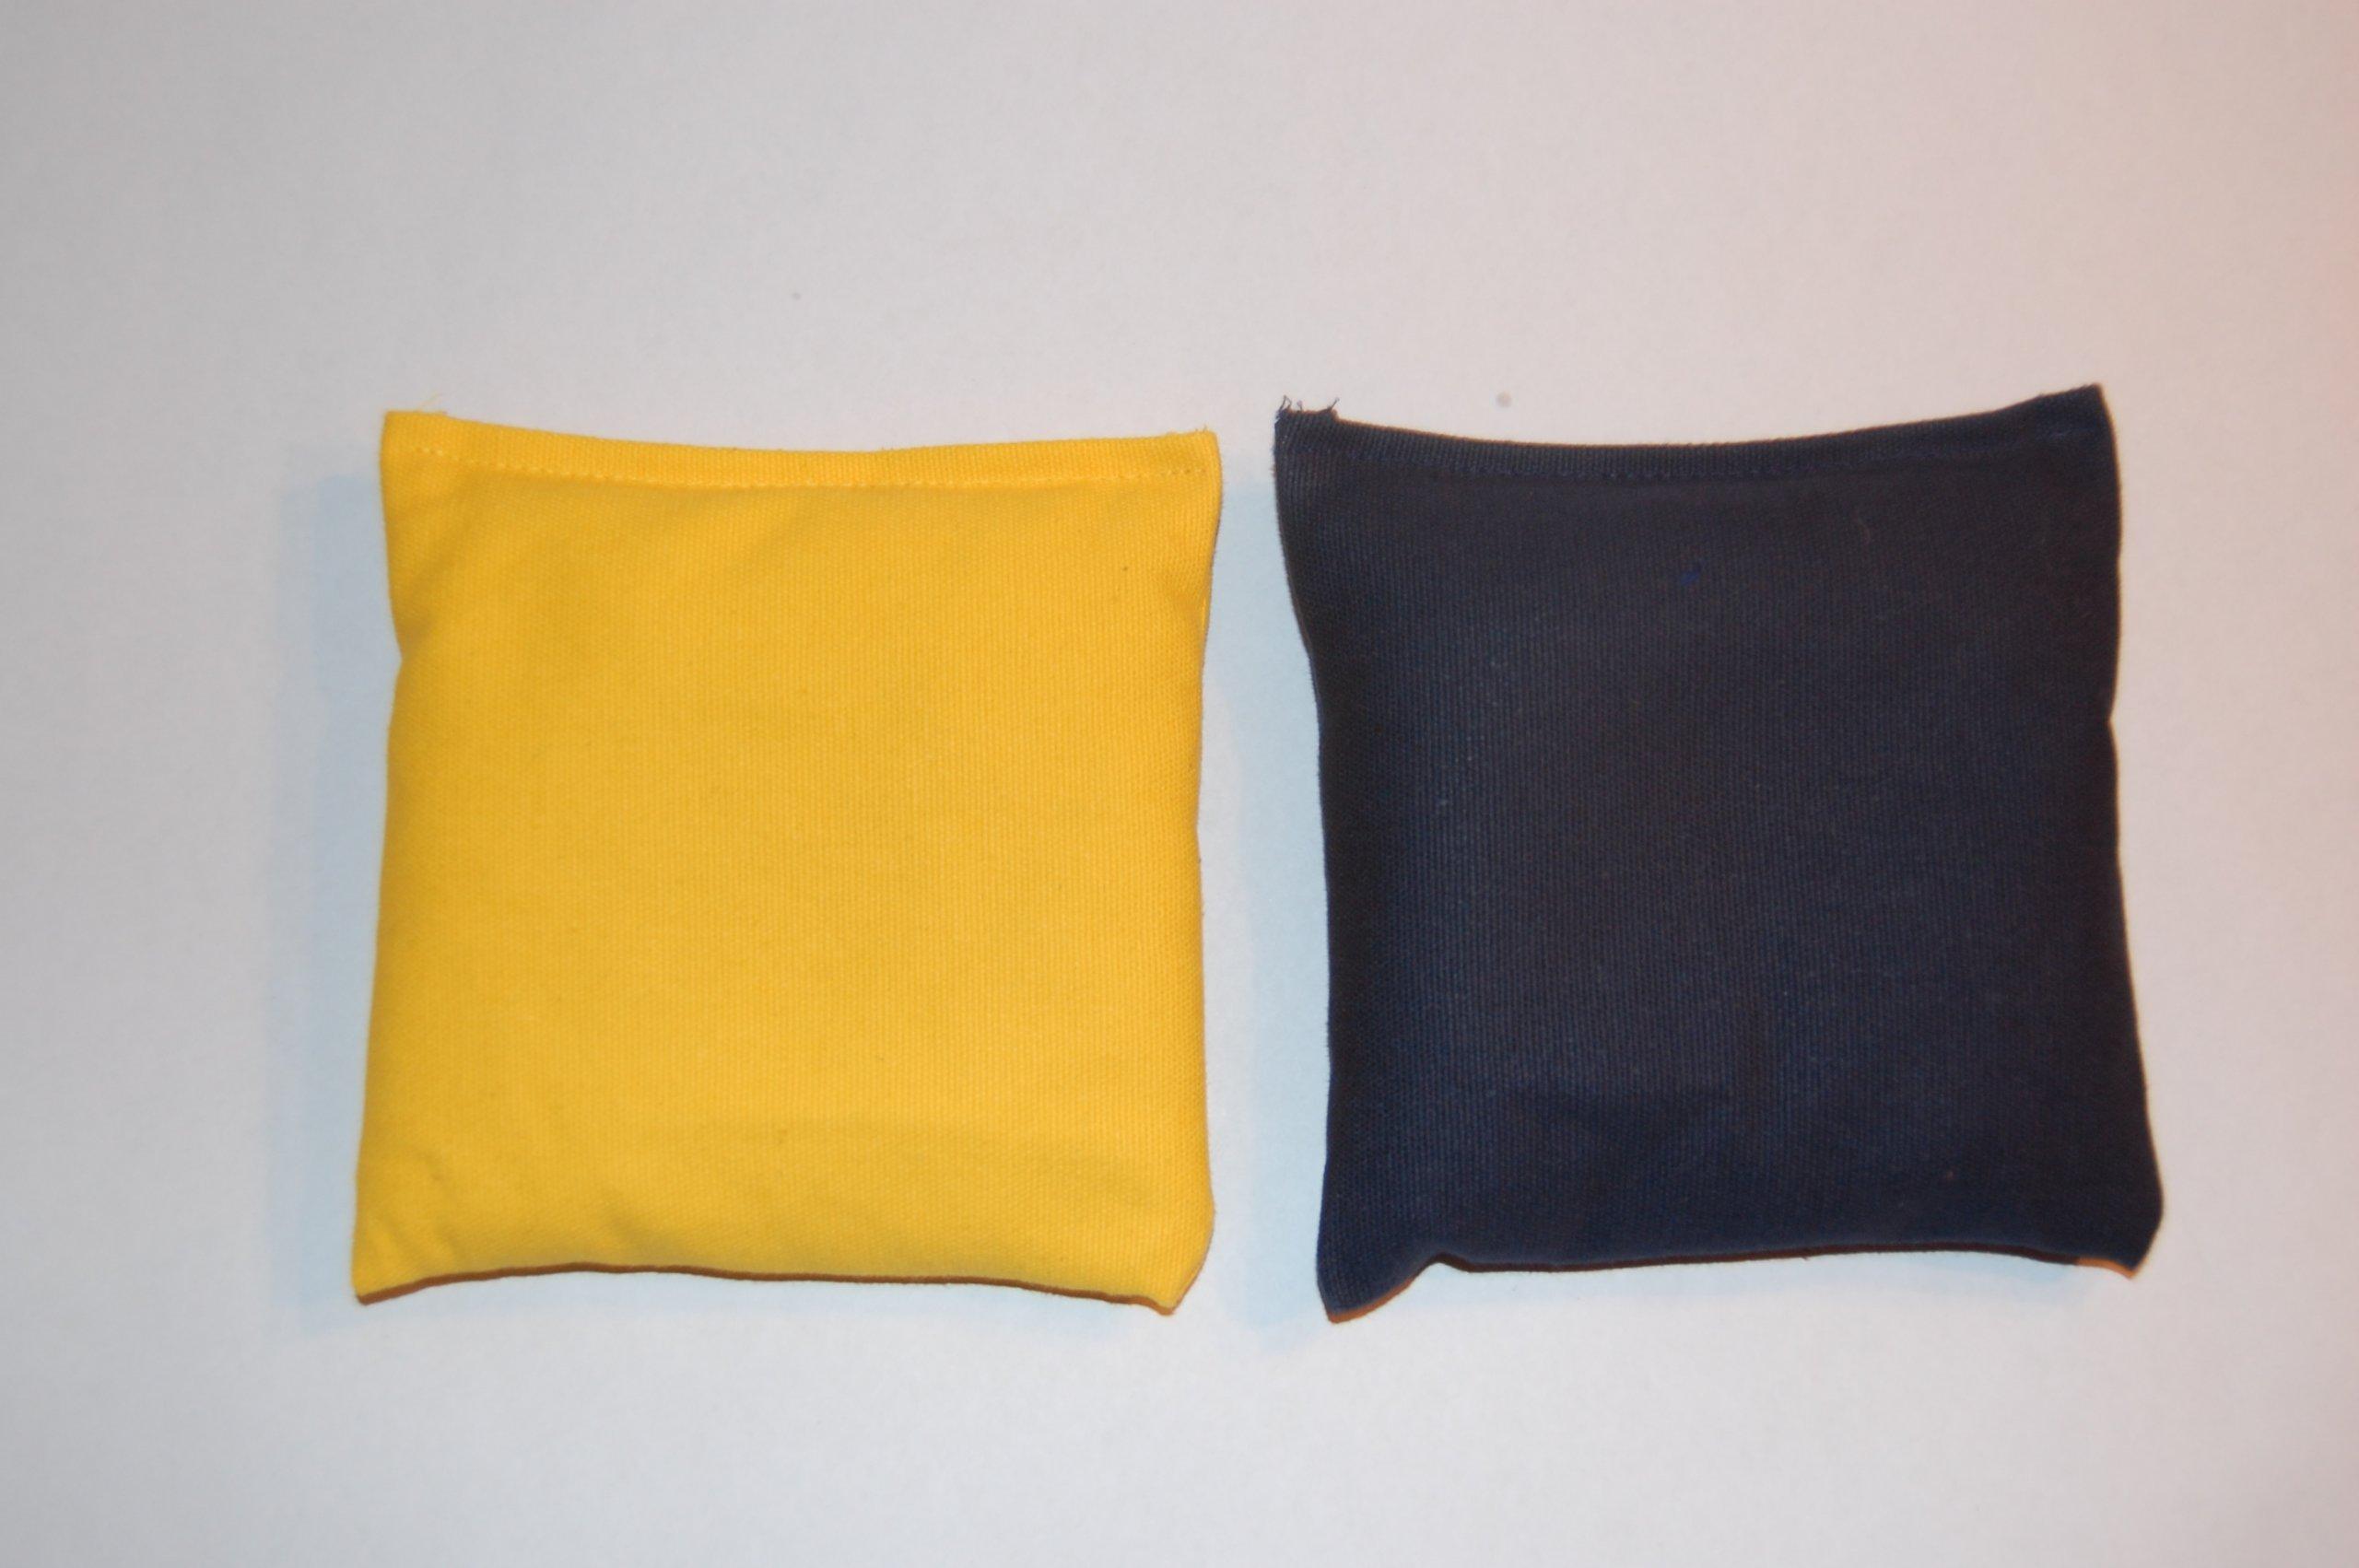 Weather Resistant Cornhole Bags (Set of 8) by SC Cornhole (Black/Yellow)